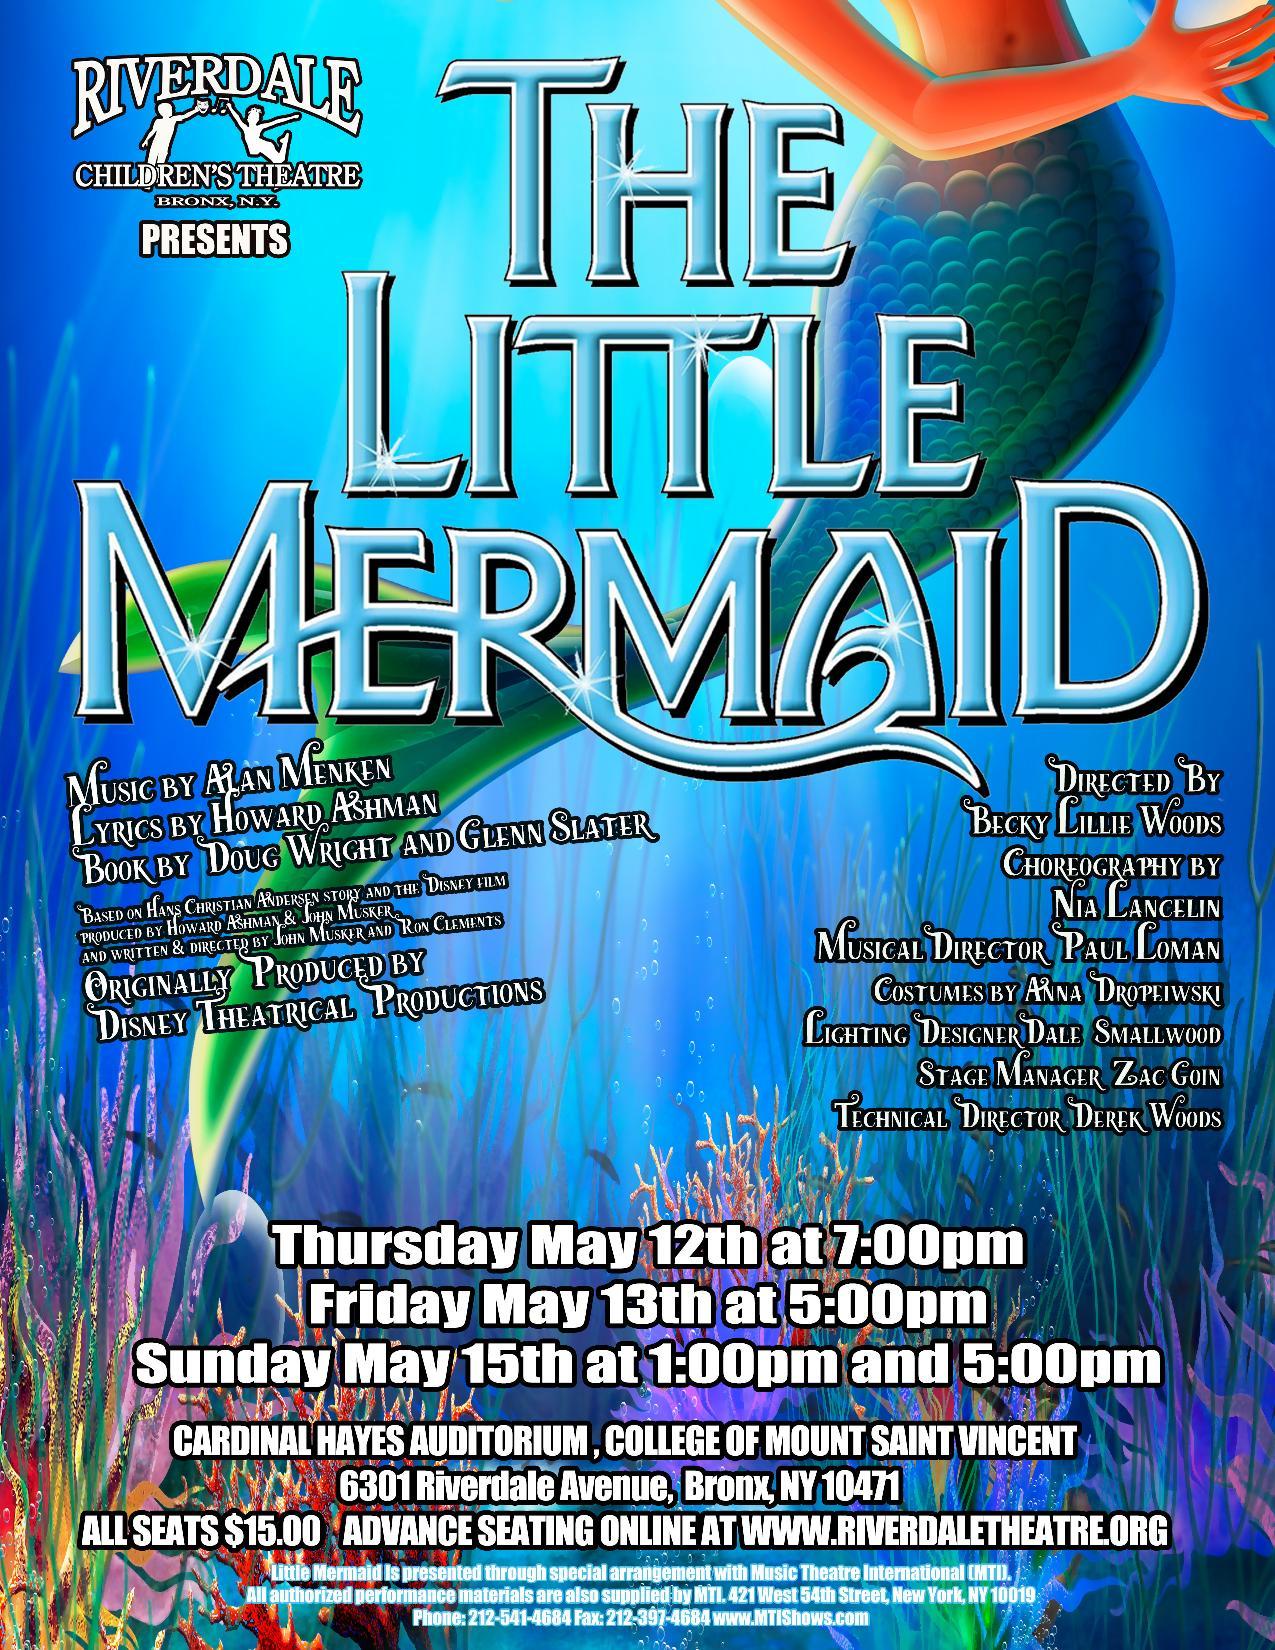 Riverdale Children's Theatre Presents Disney's The Little Mermaid